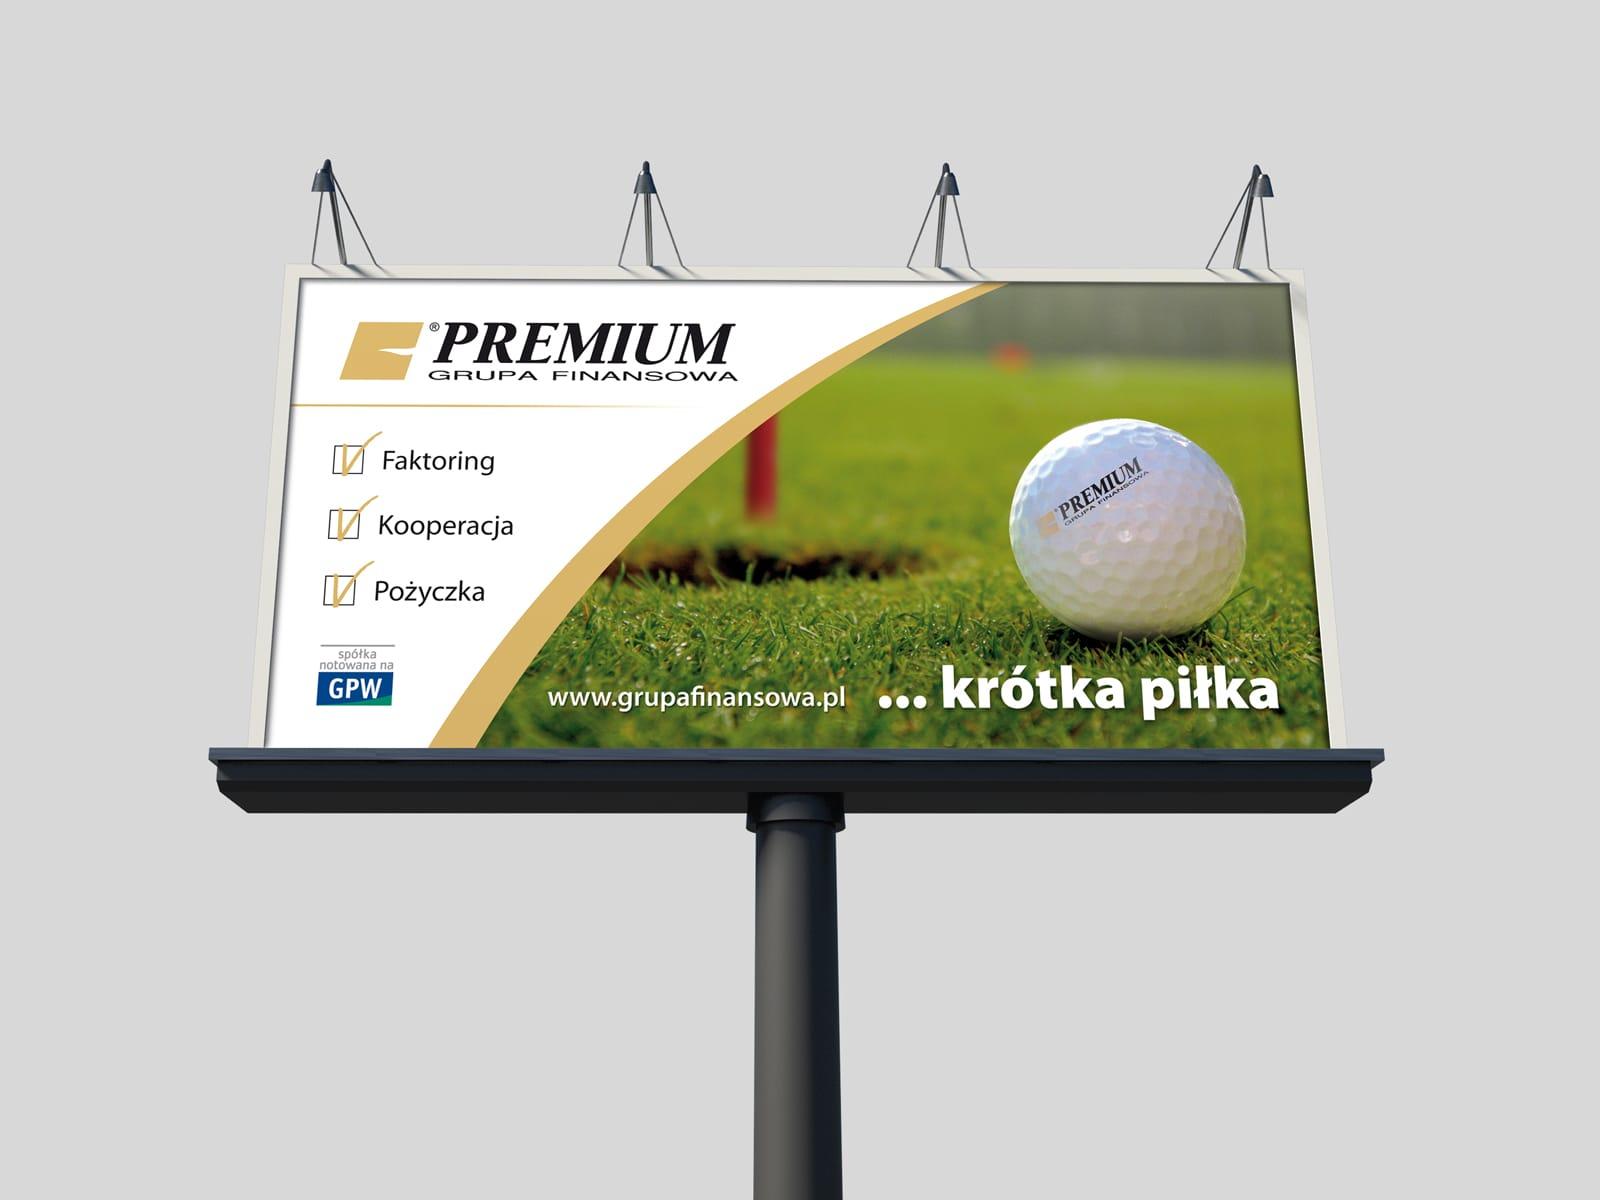 Grupa Finansowa Premium S.A. billboard